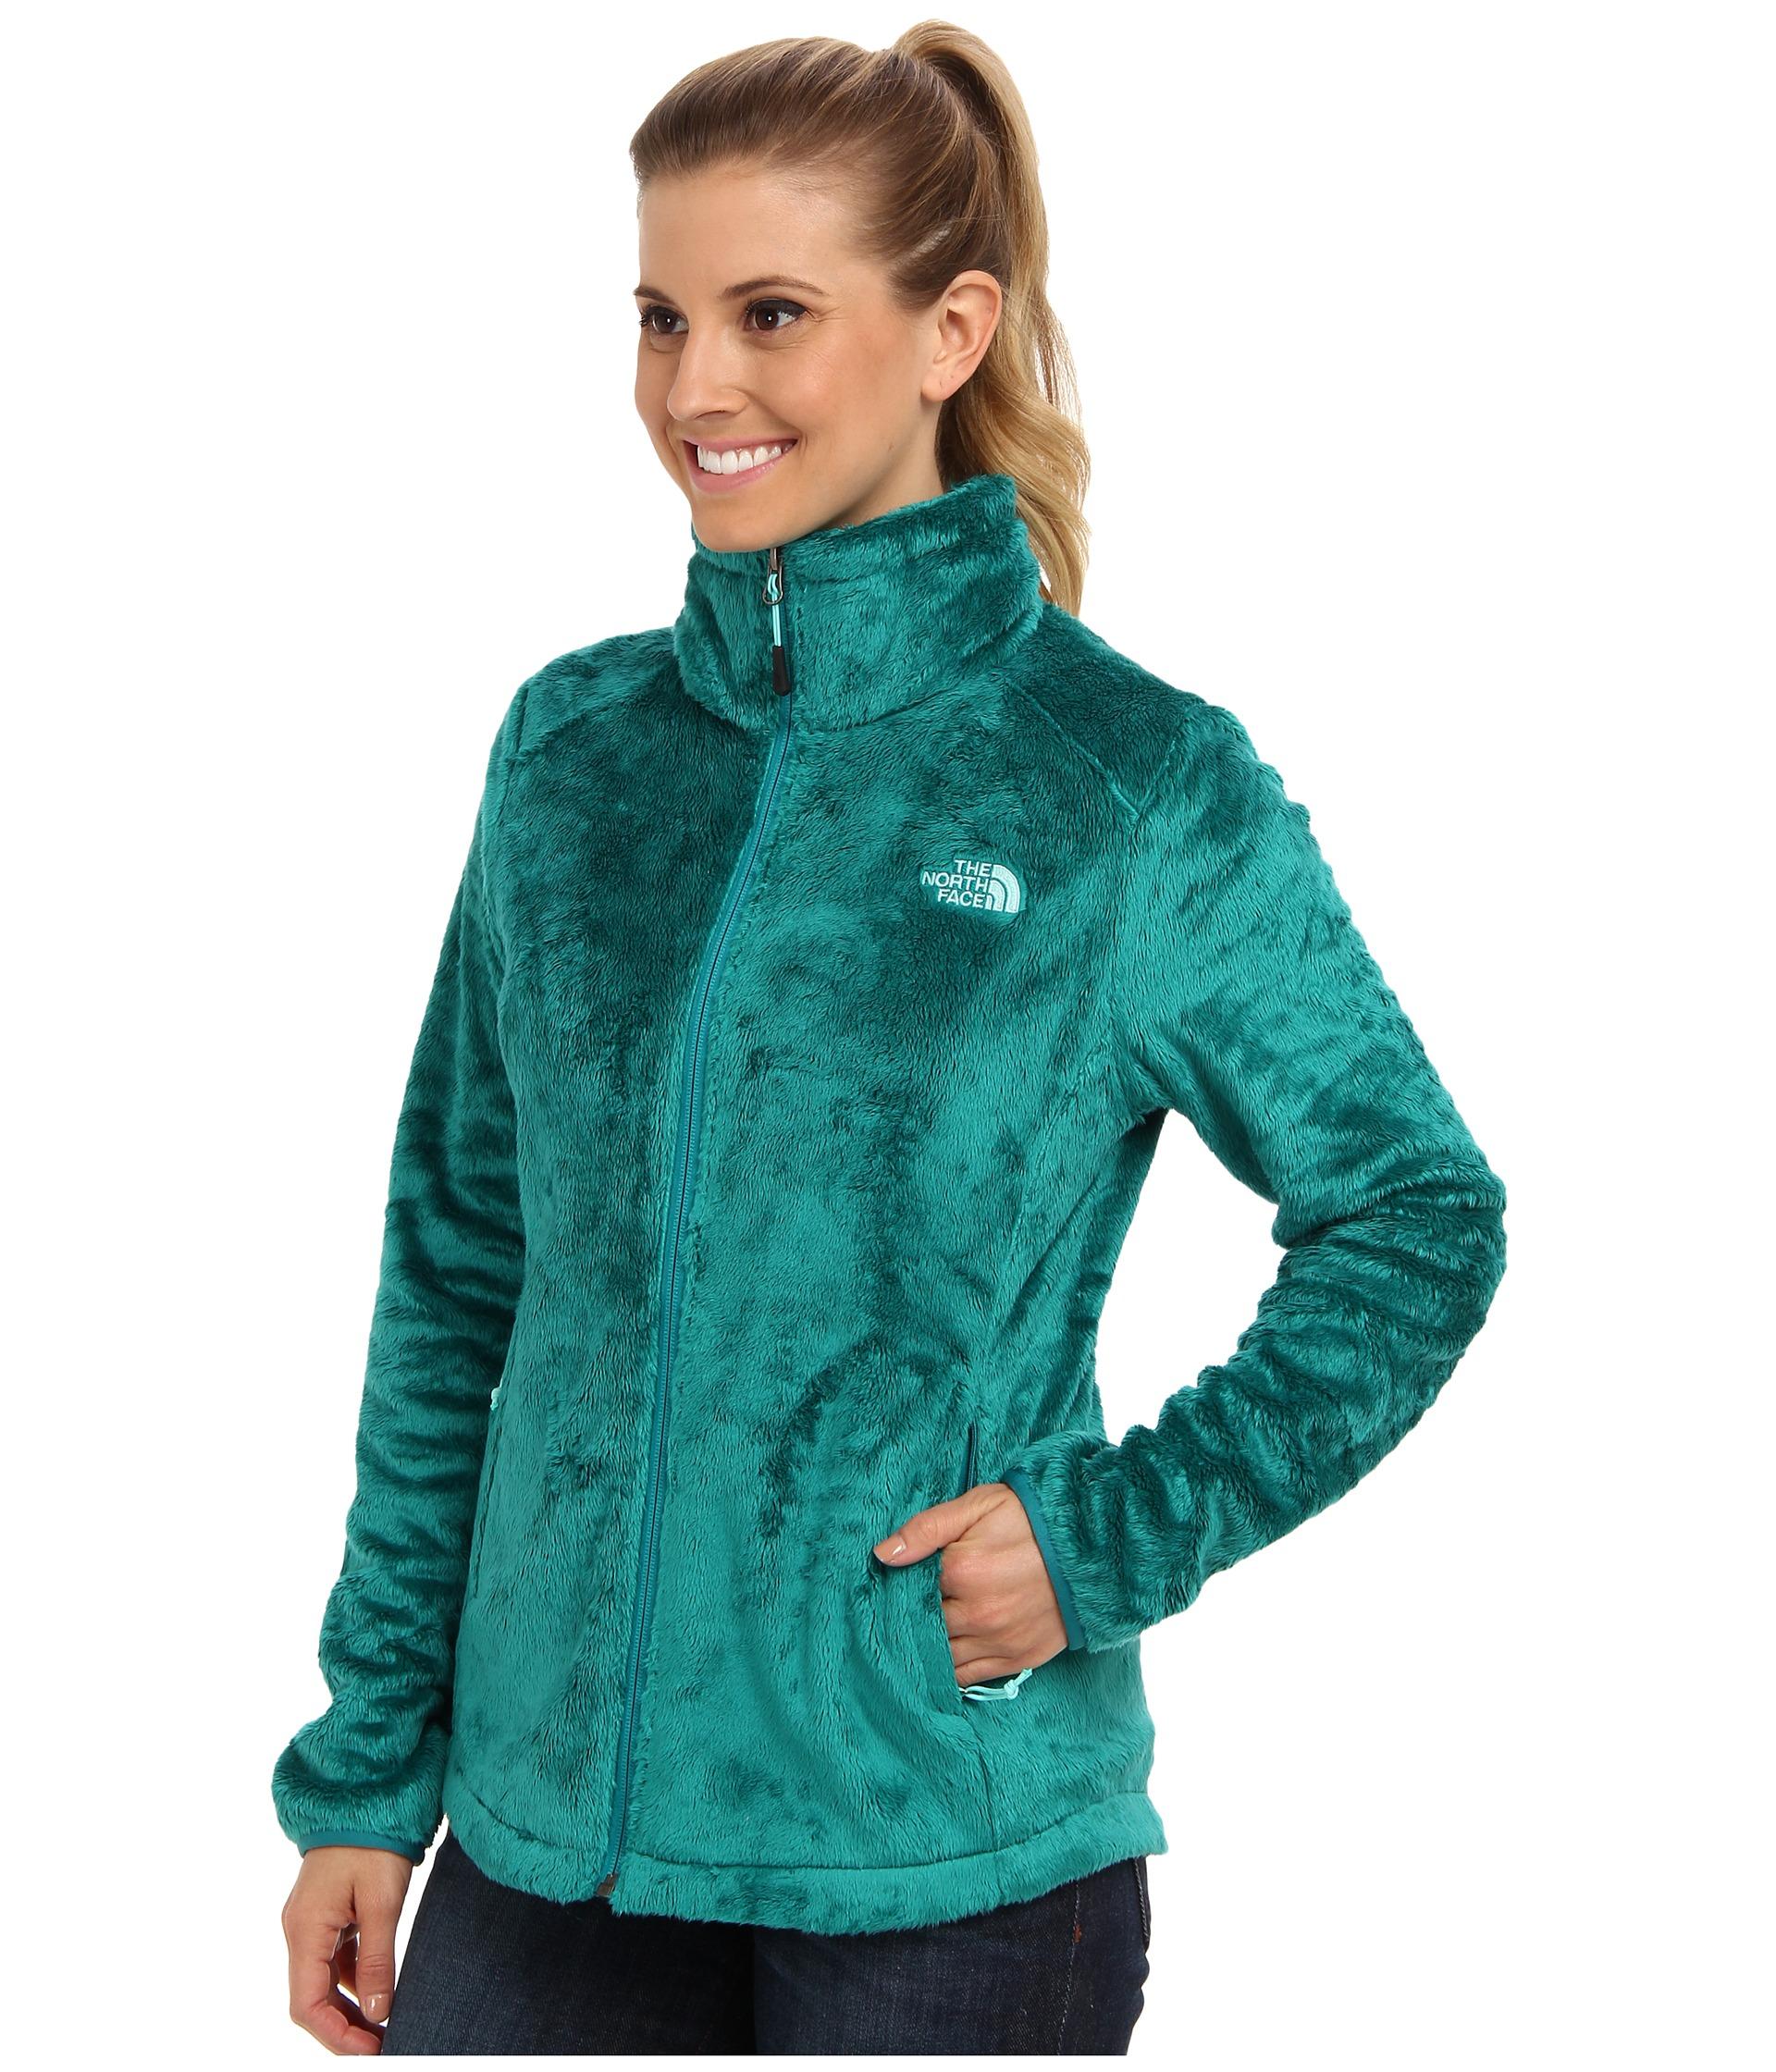 Osito 2 North Face Jacket